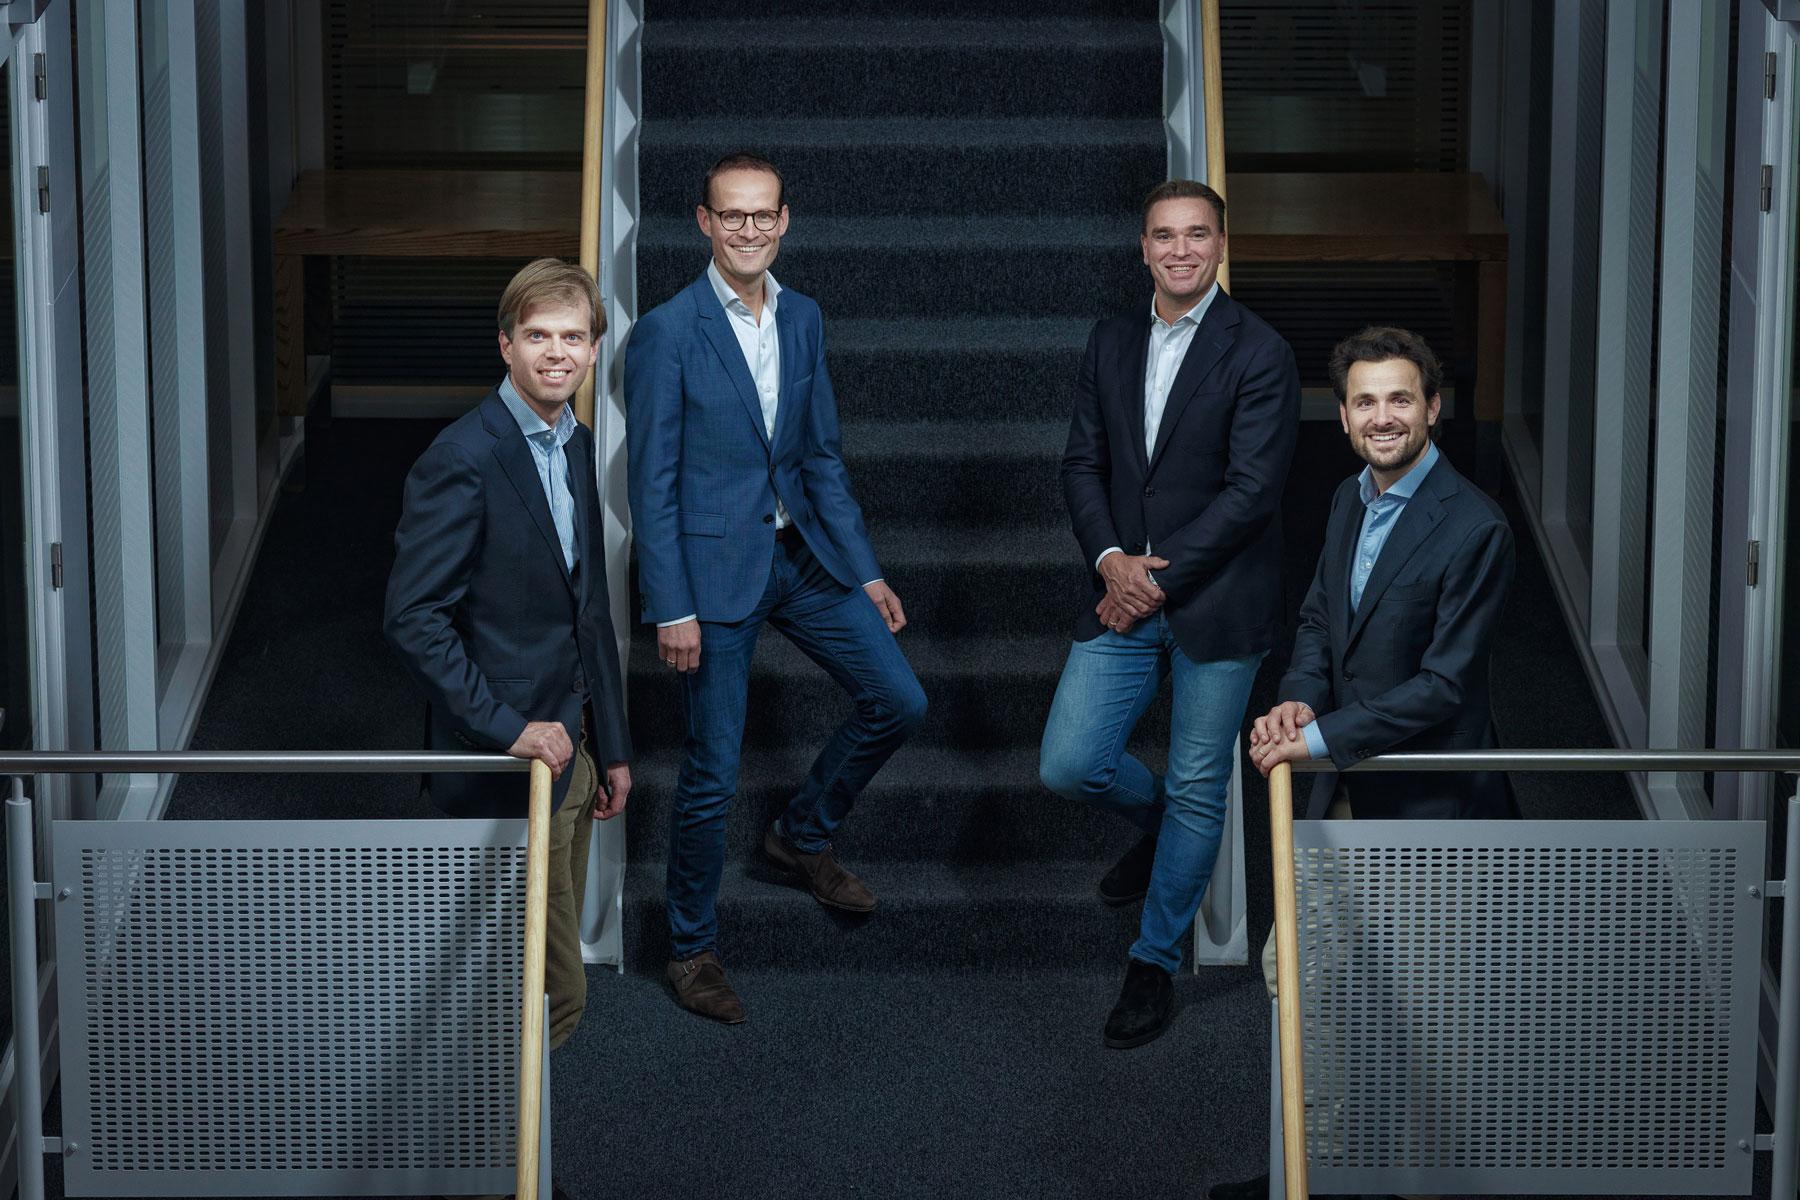 Marktlink Investment Partners